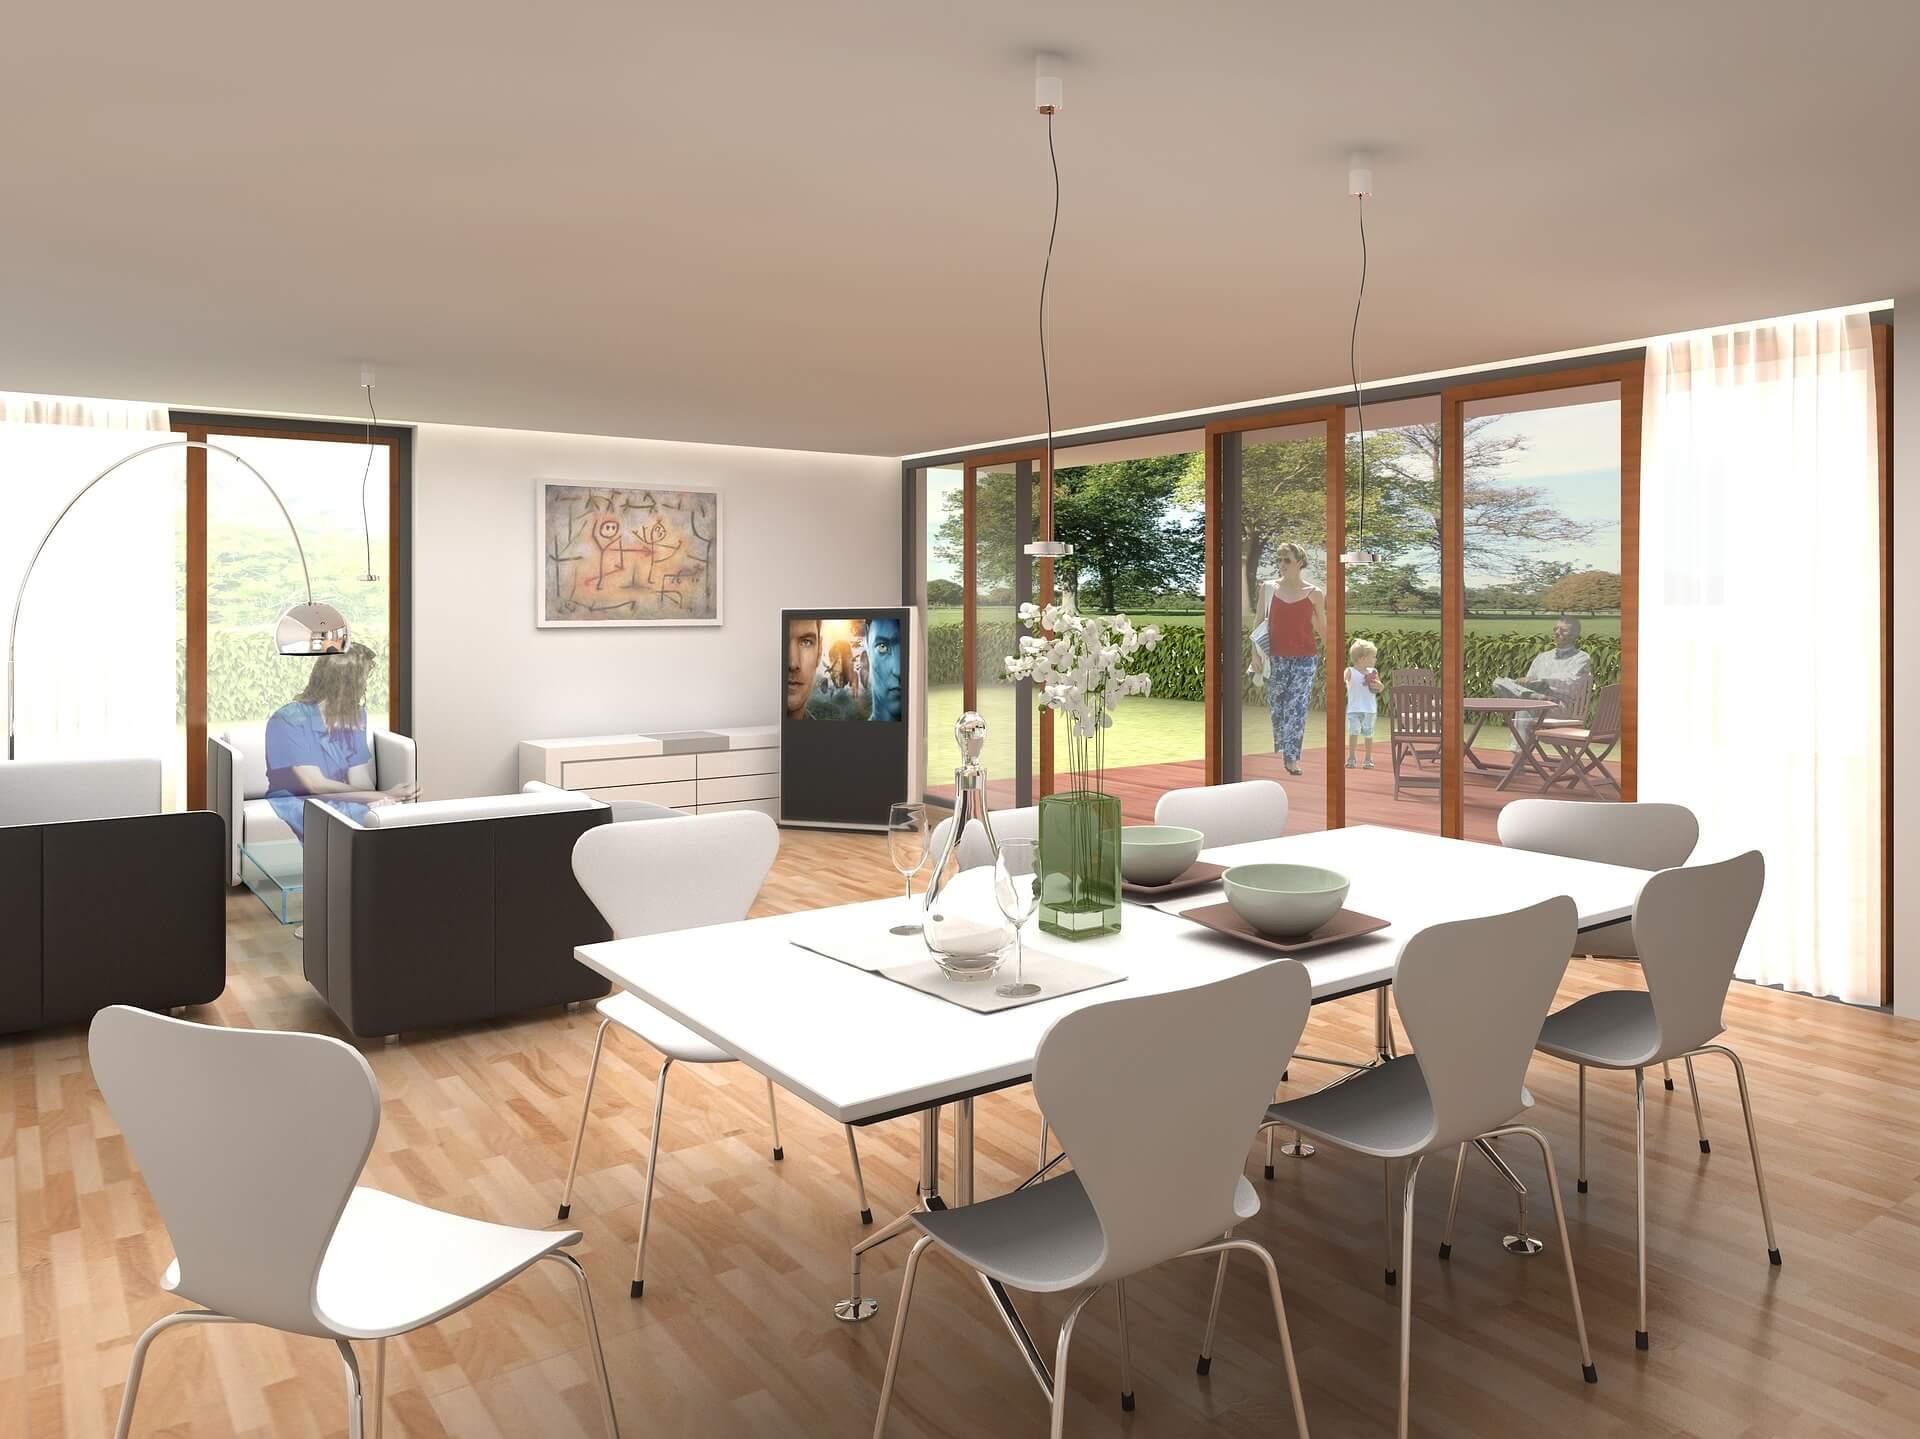 The Mortgage Professionals-interior-1026454_1920 (1)